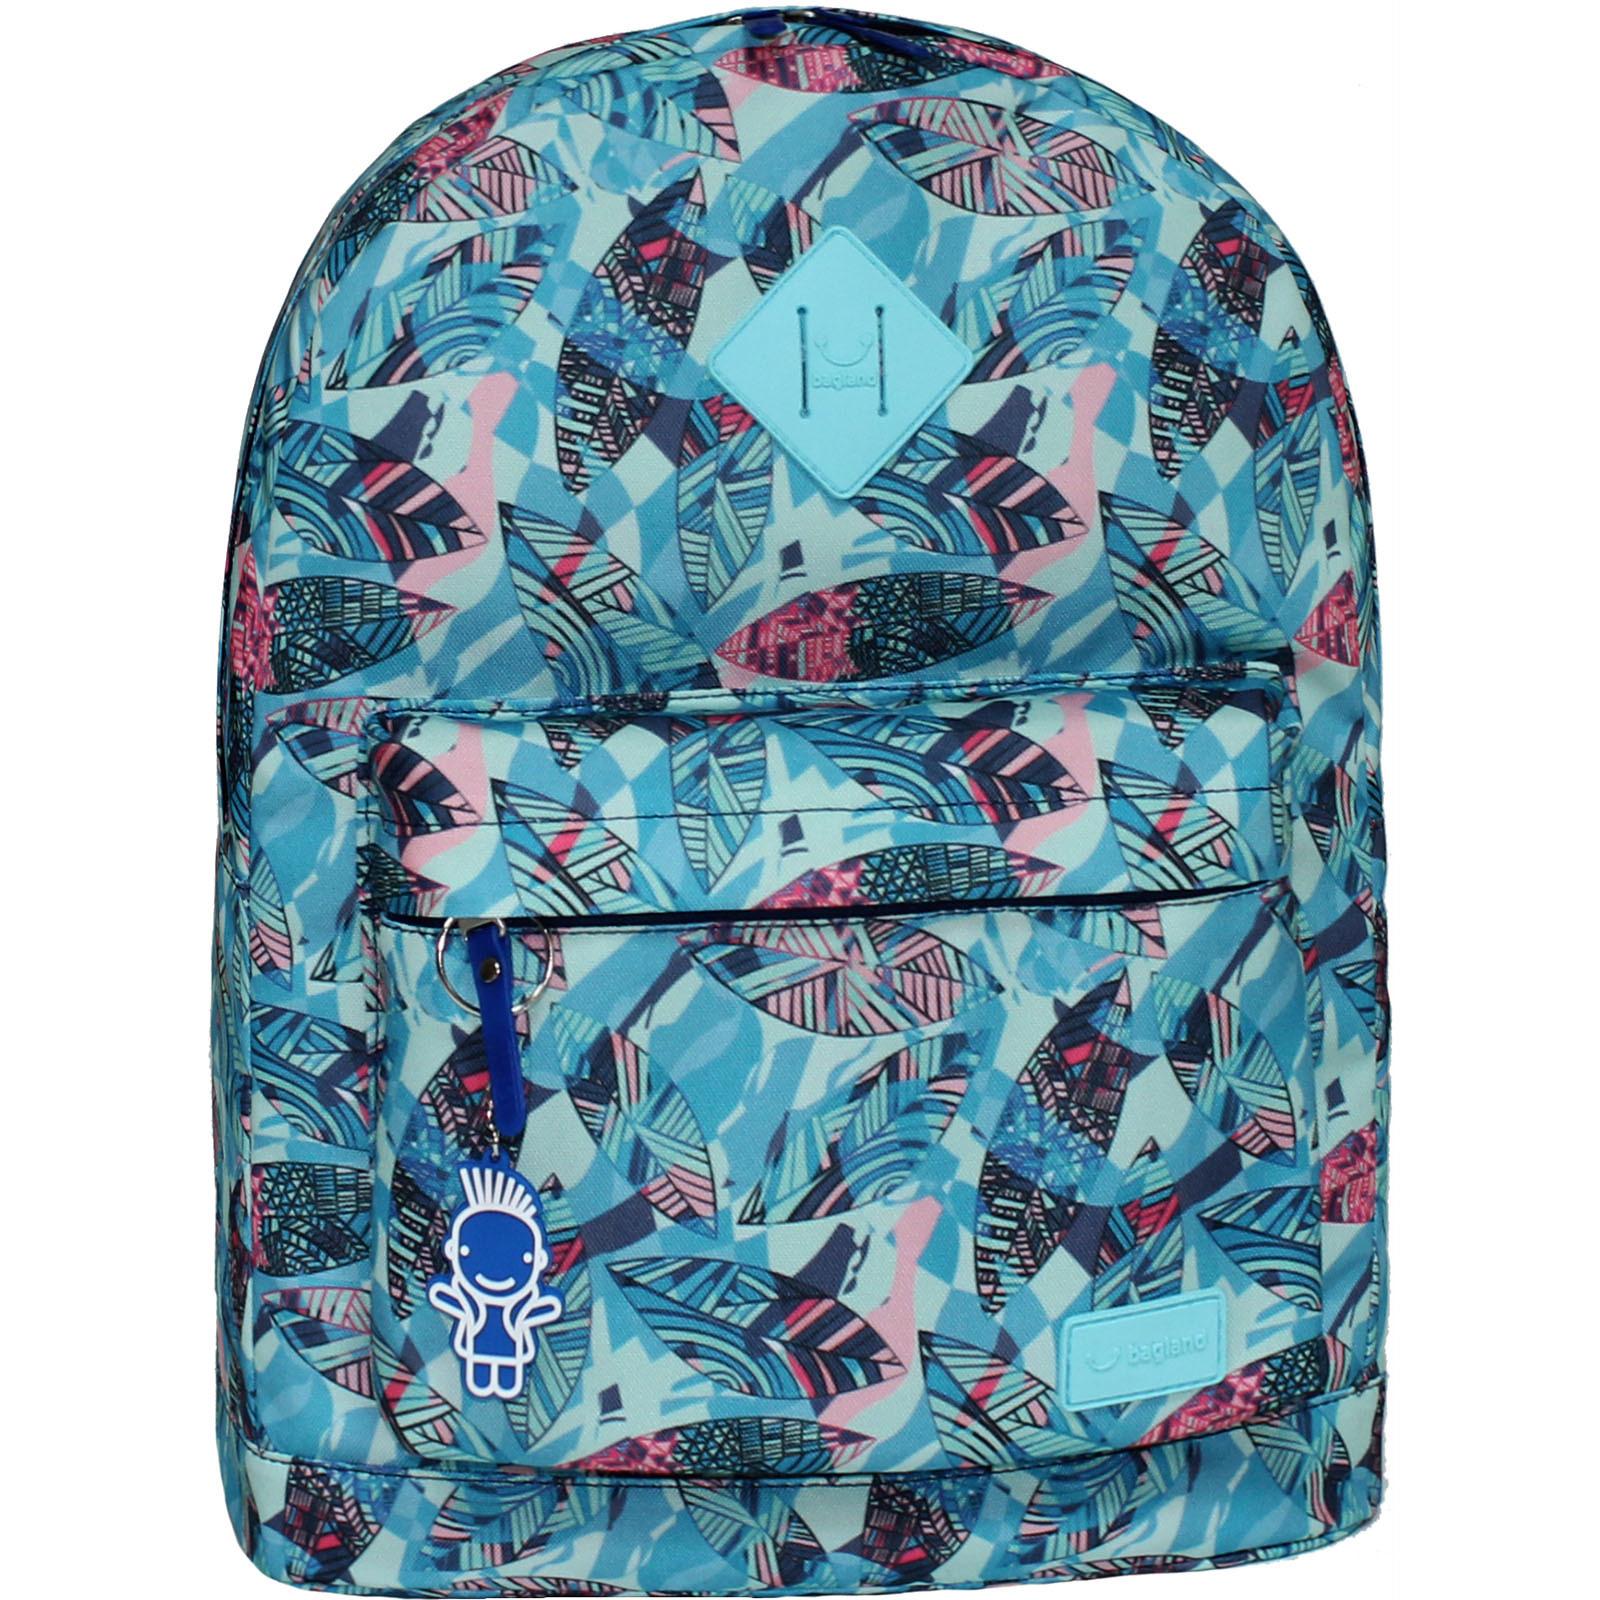 Городские рюкзаки Рюкзак Bagland Молодежный (дизайн) 17 л. сублимация 210 (00533664) IMG_7066_210.JPG